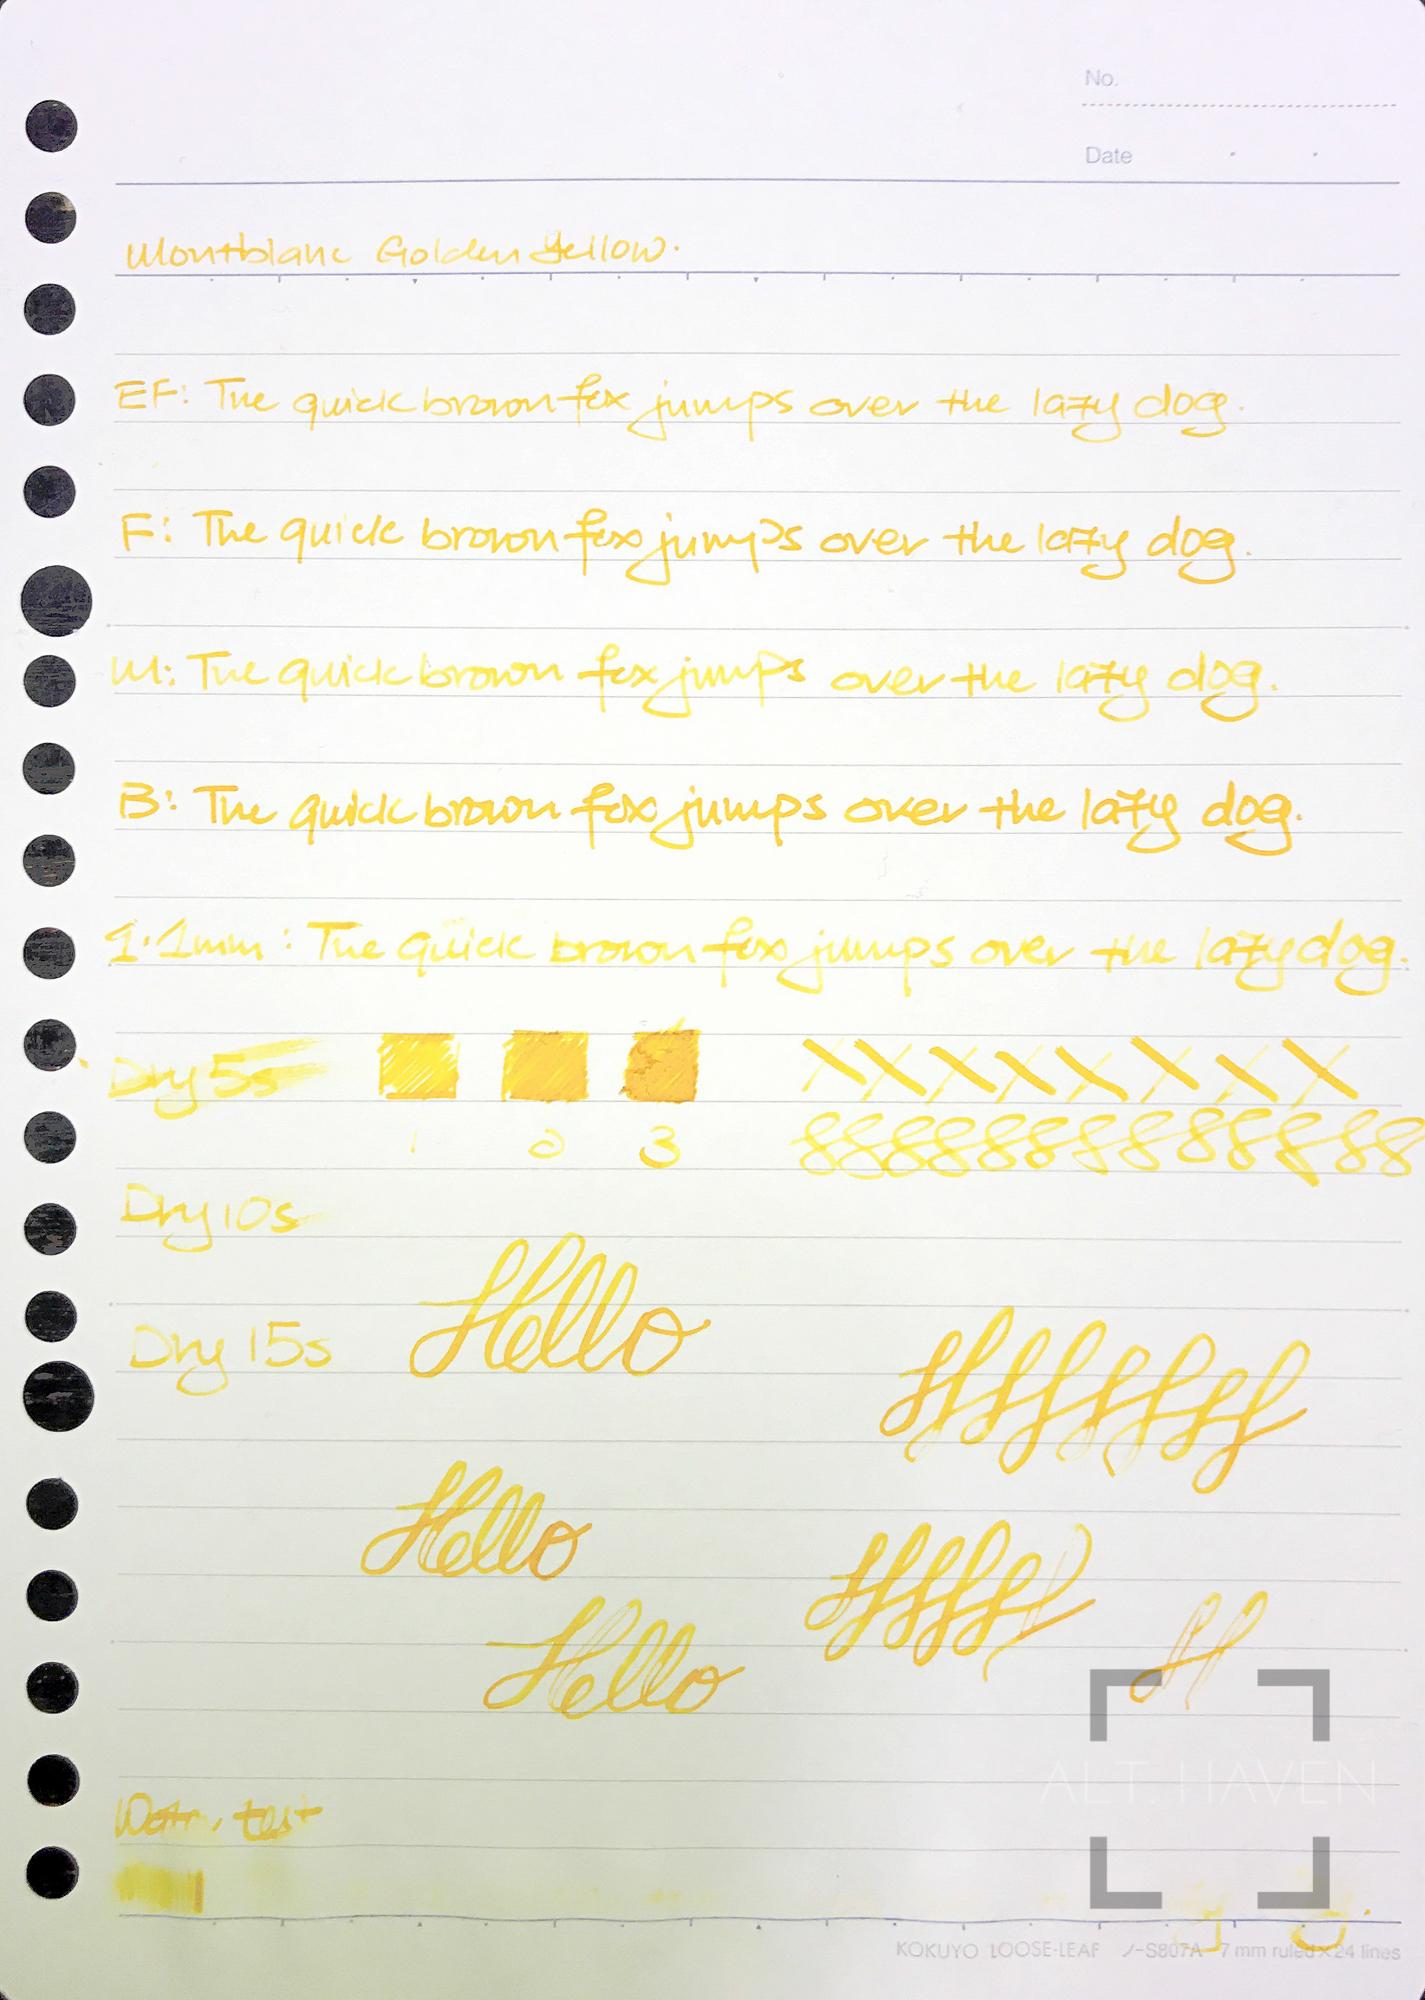 Montblanc Golden Yellow 1.jpg